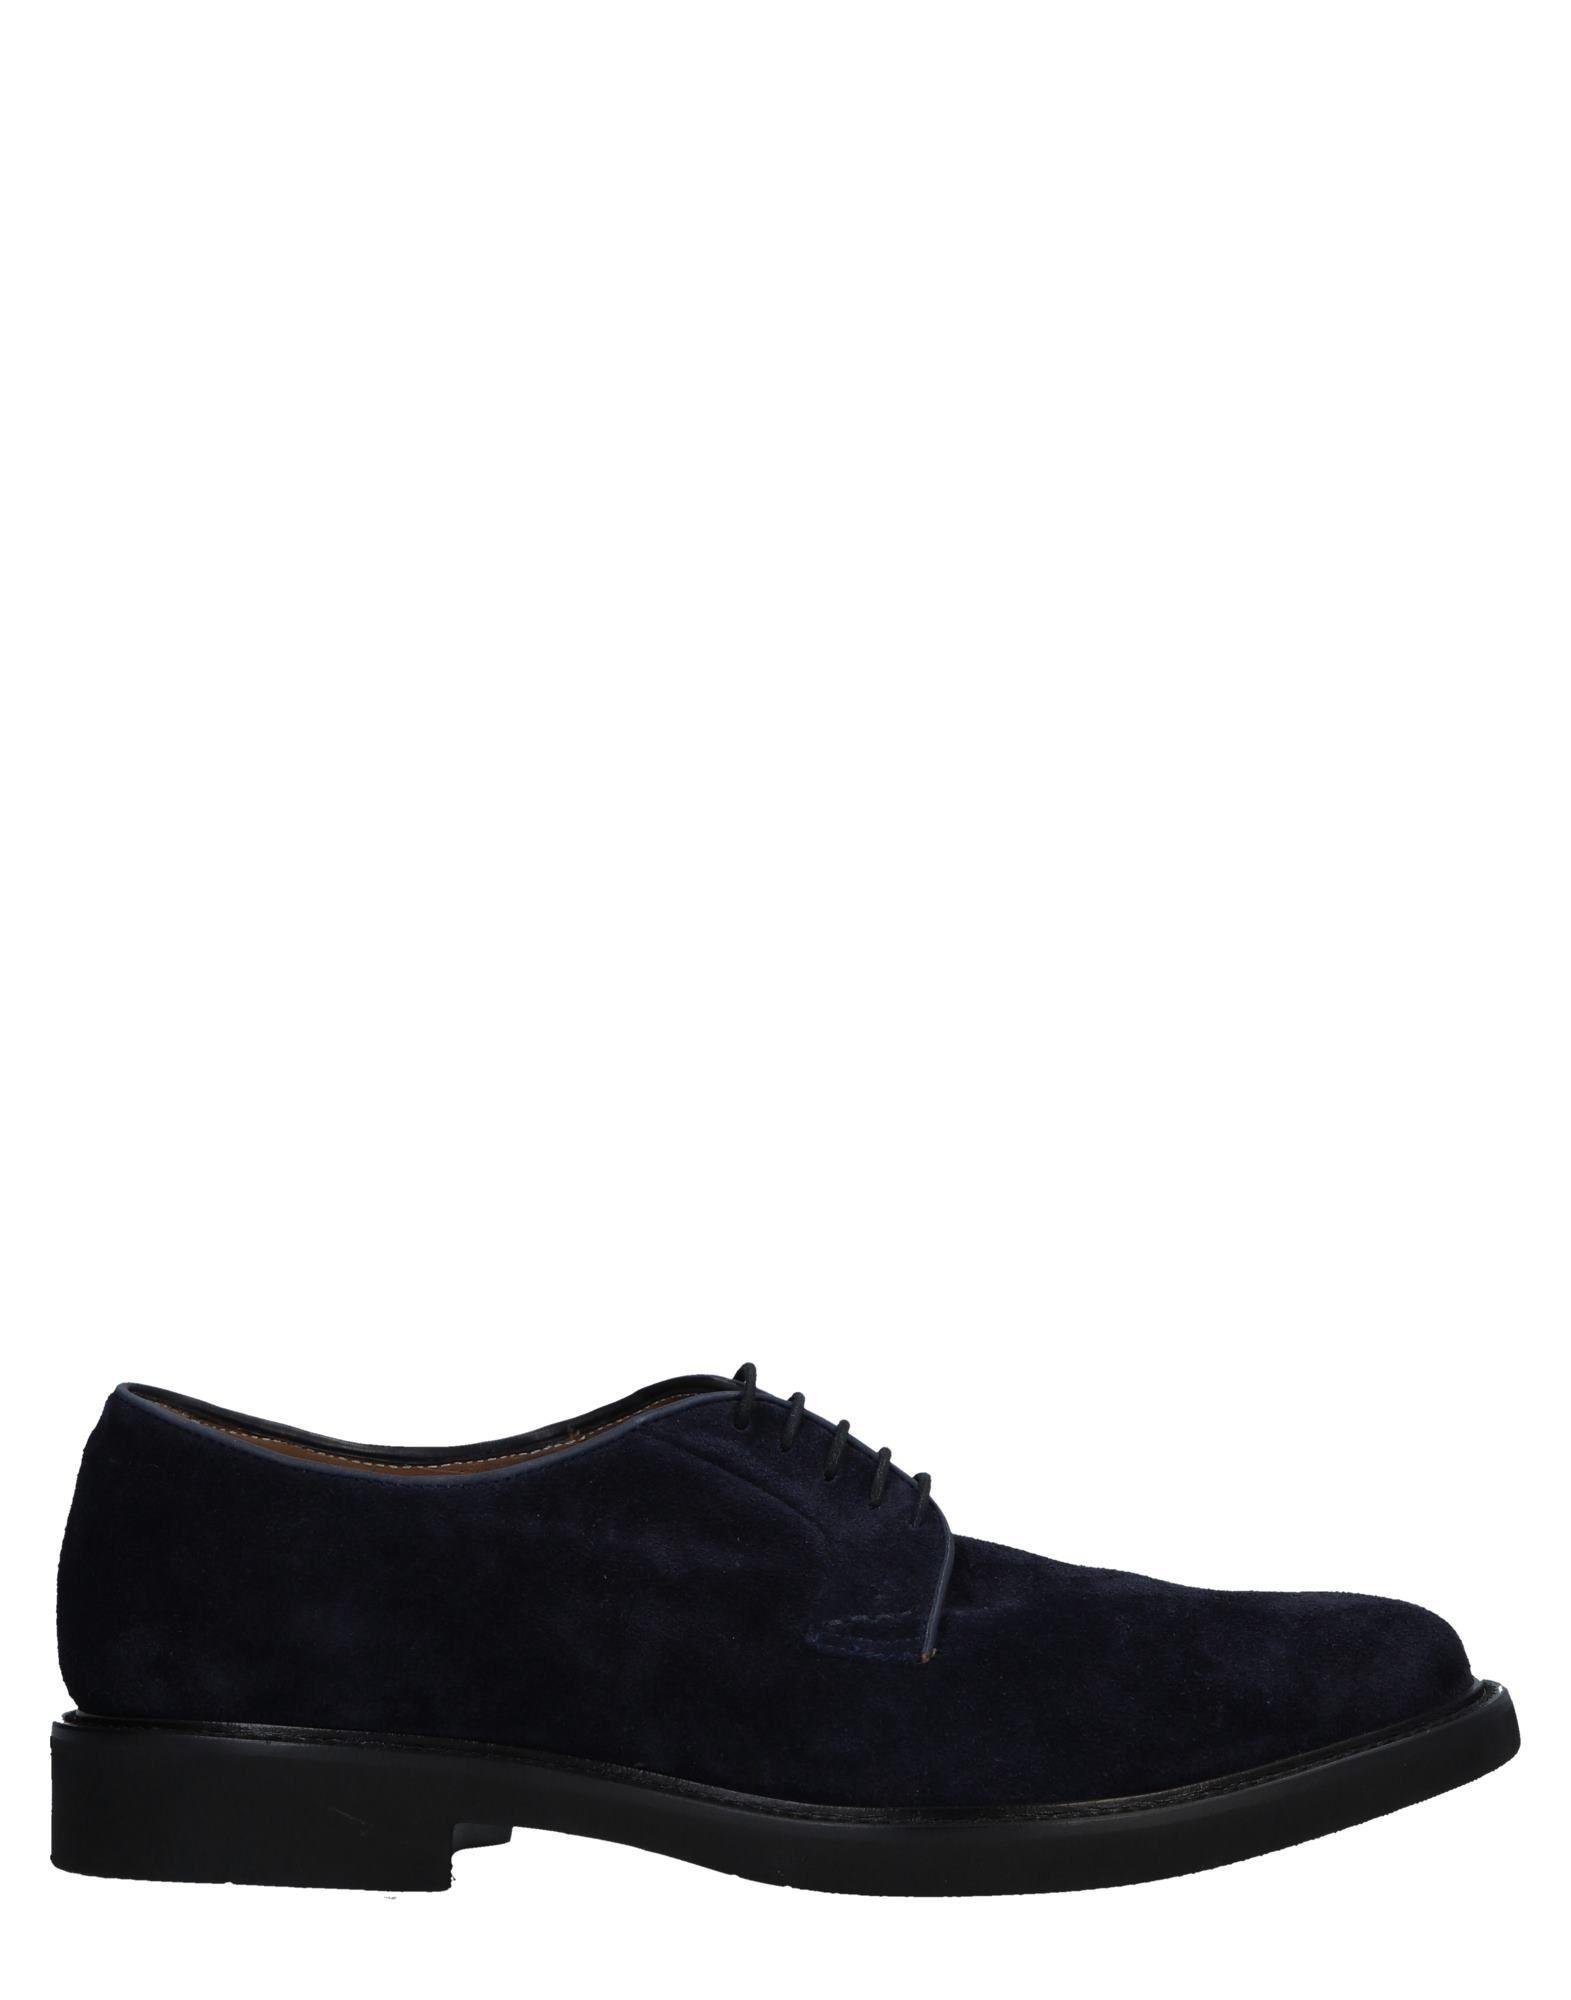 BRIGHTON Обувь на шнурках courtney barnett brighton